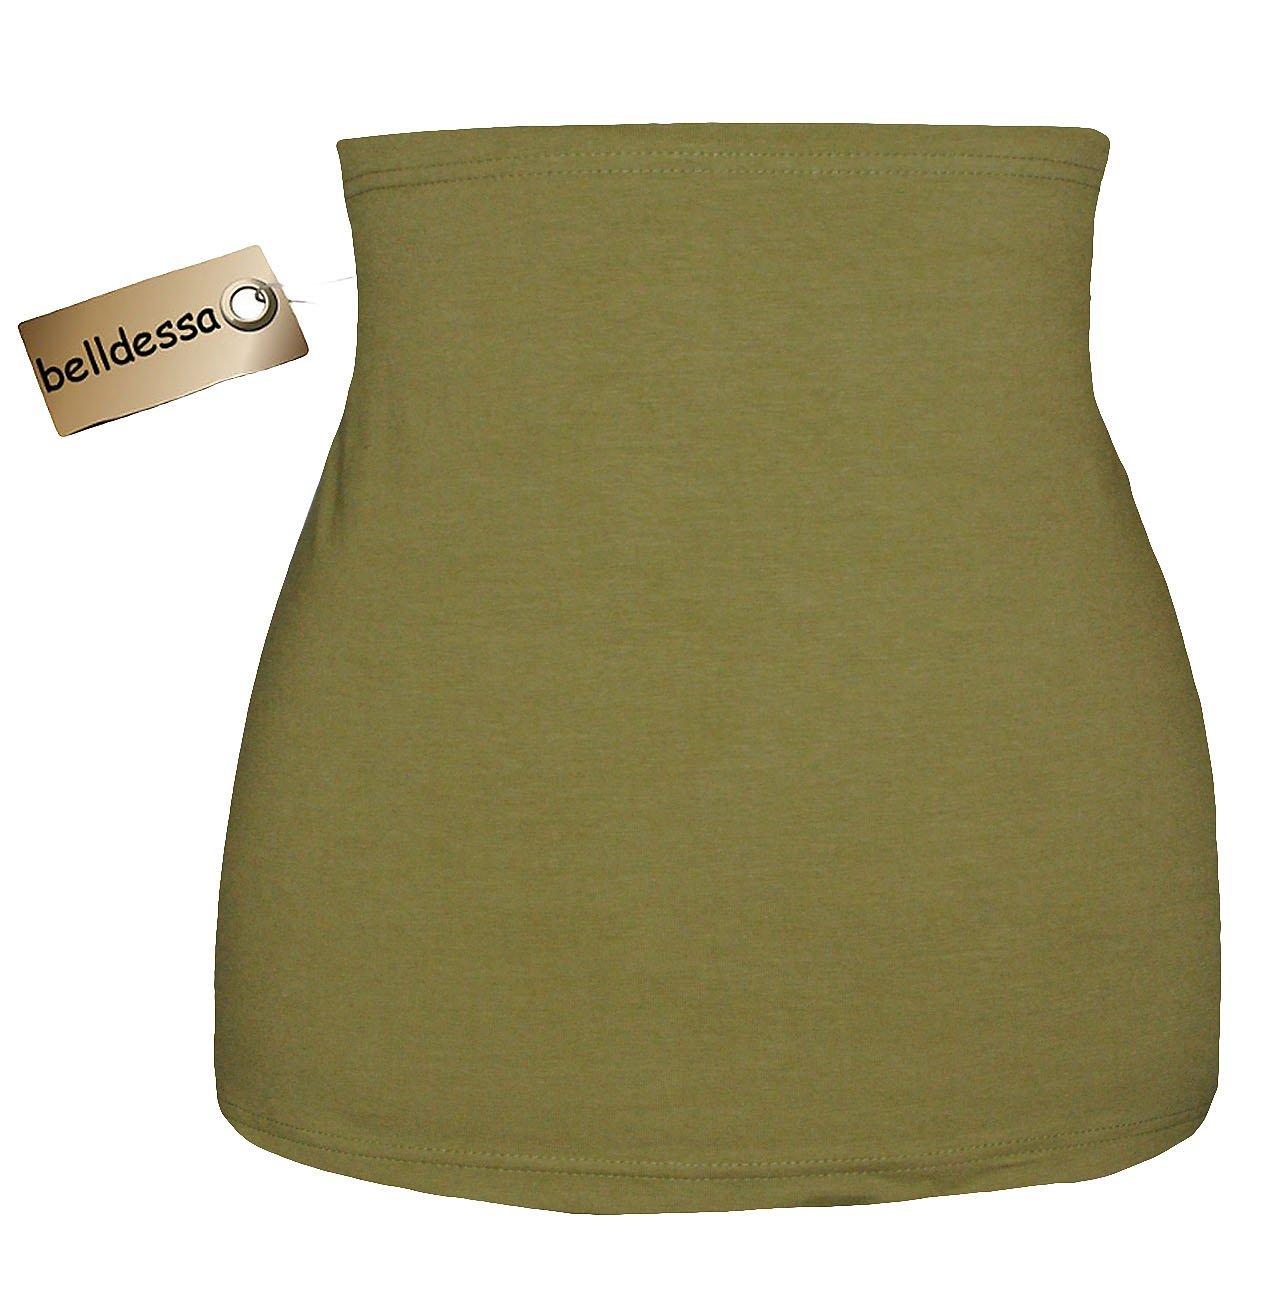 Belldessa Jersey Baumwolle - oliv grun - Nierenwärmer / Rückenwärmer / Bauchwärmer / Shi..